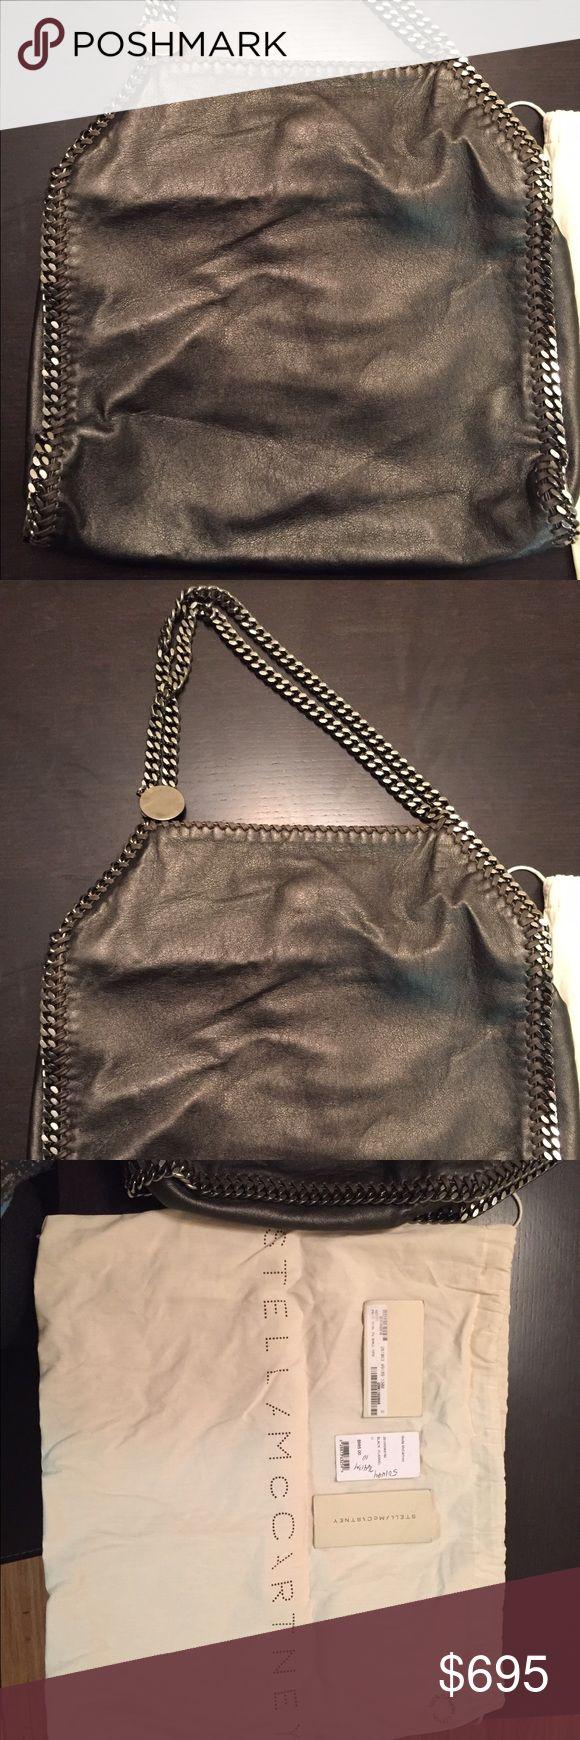 "Stella McCartney Falabella Shoulder Bag Great condition gun metal grey Shoulder Bag. 14"" tall and 14"" wide. Stella McCartney Bags Shoulder Bags"